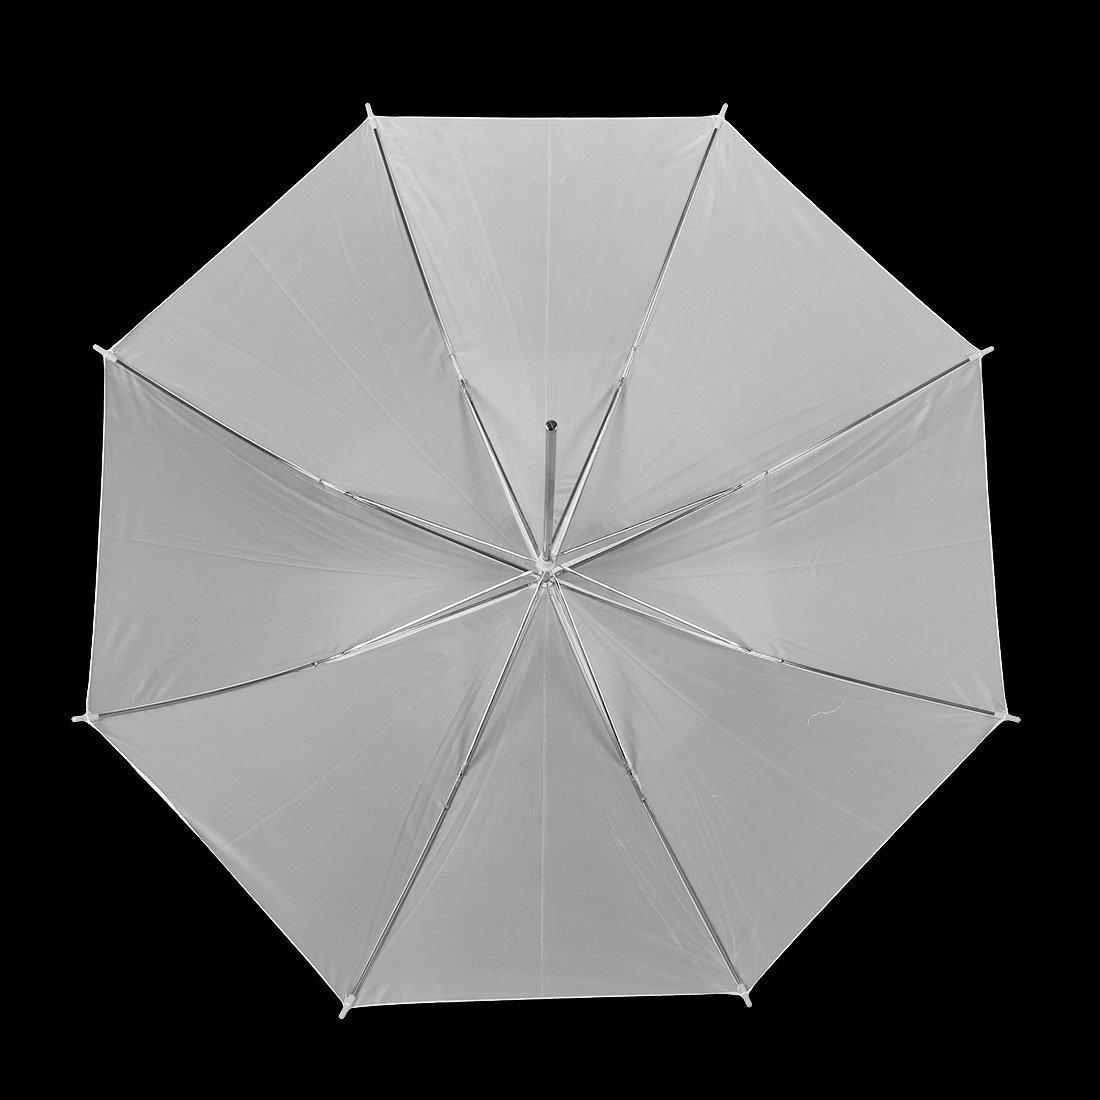 Amazon.com: eDealMax 86cm Diámetro plegable luz Suave de estudio Fotografía Paraguas Blanco: Electronics